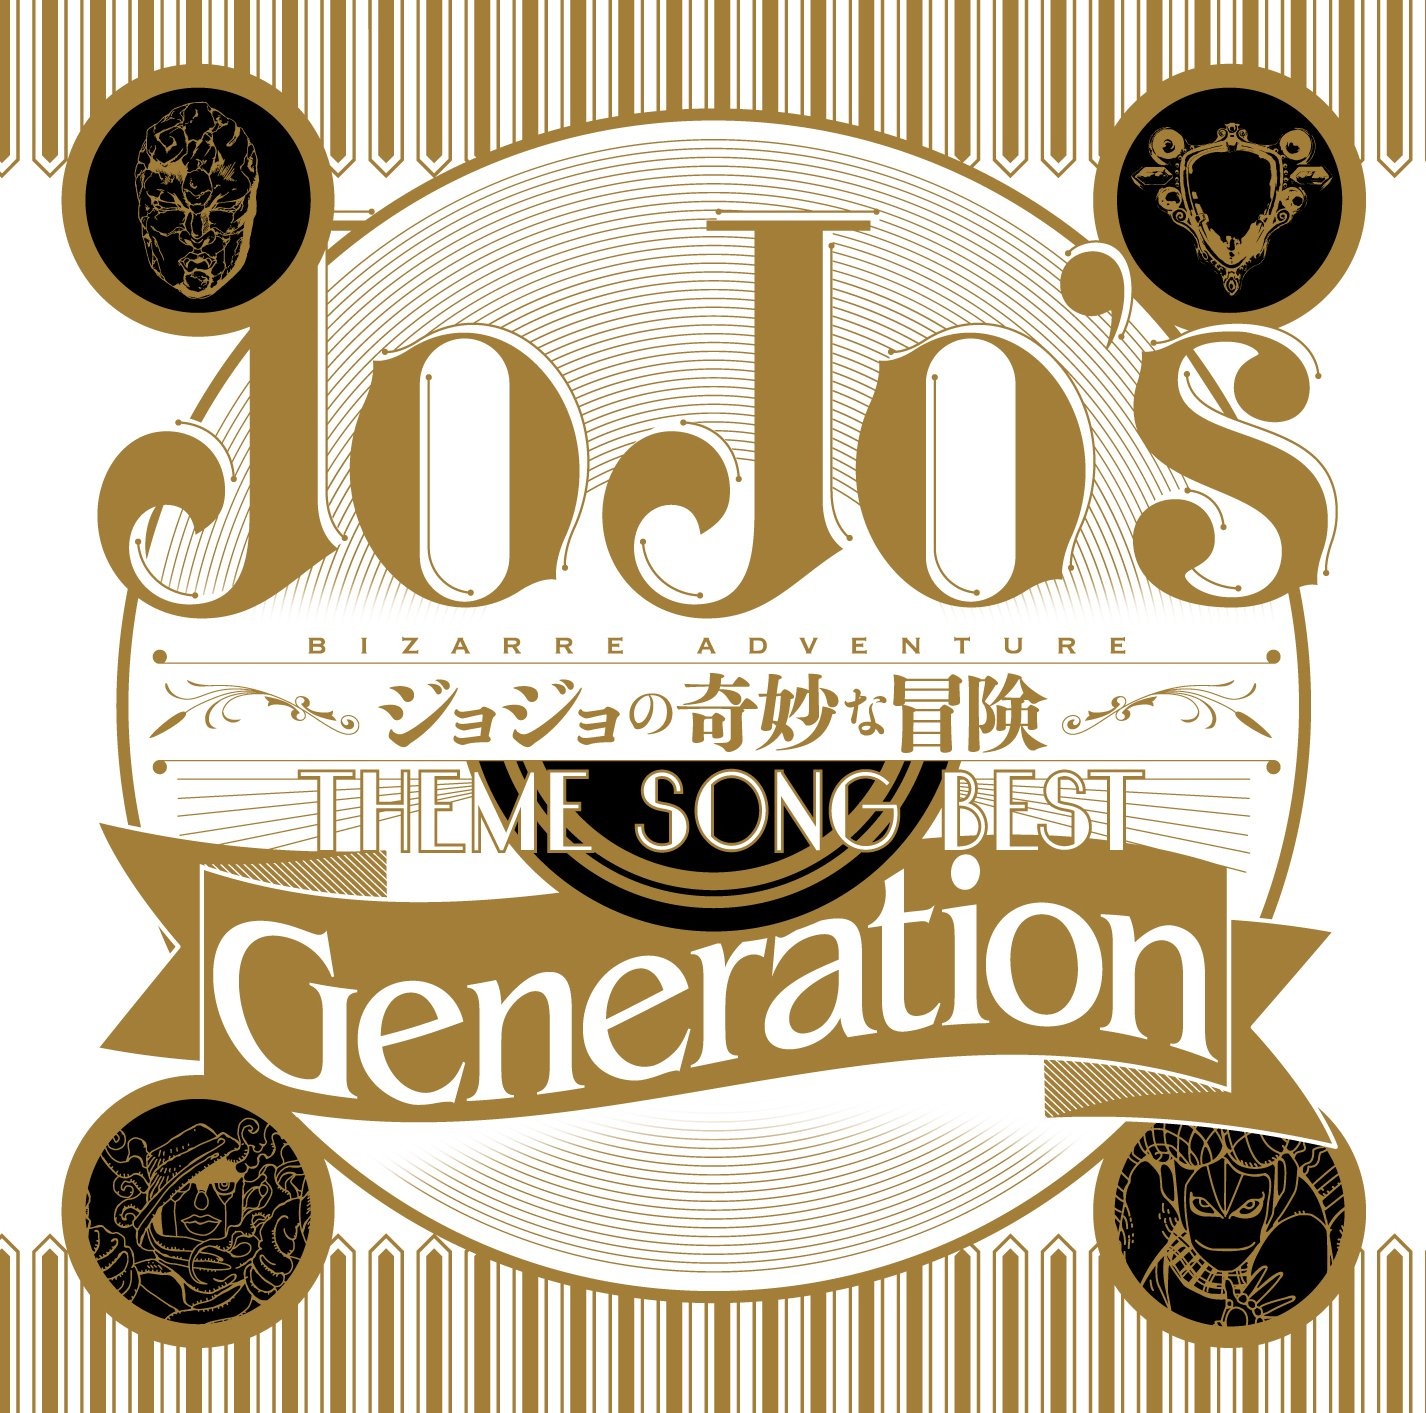 TV ANIME JOJO`S BIZARRE ADVENTURE THEME SONG BEST (GENERATION ...